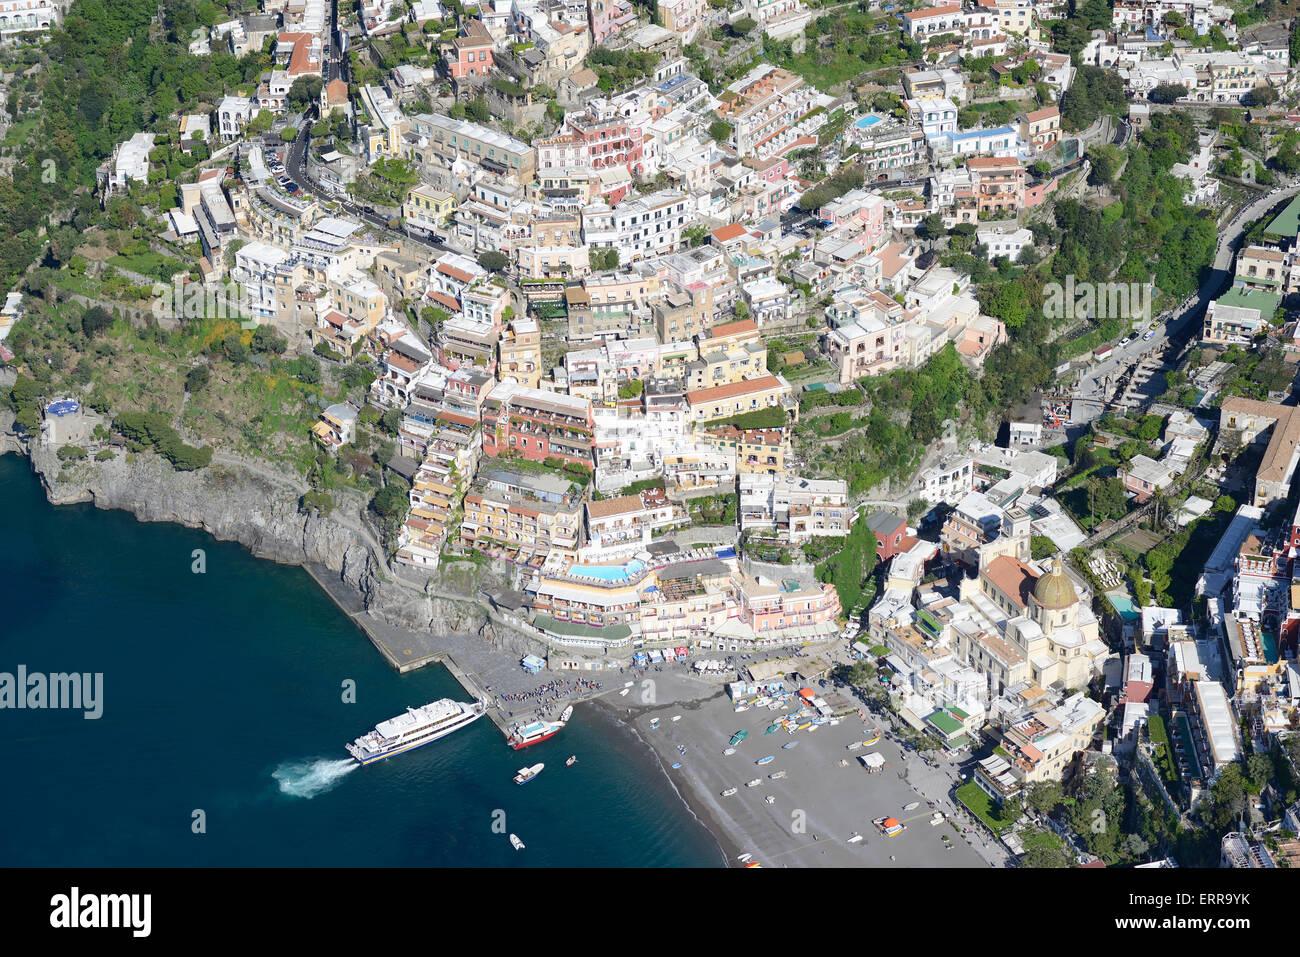 SEASIDE RESORT OF POSITANO (aerial view). Amalfi Coast, Campania, Italy. - Stock Image